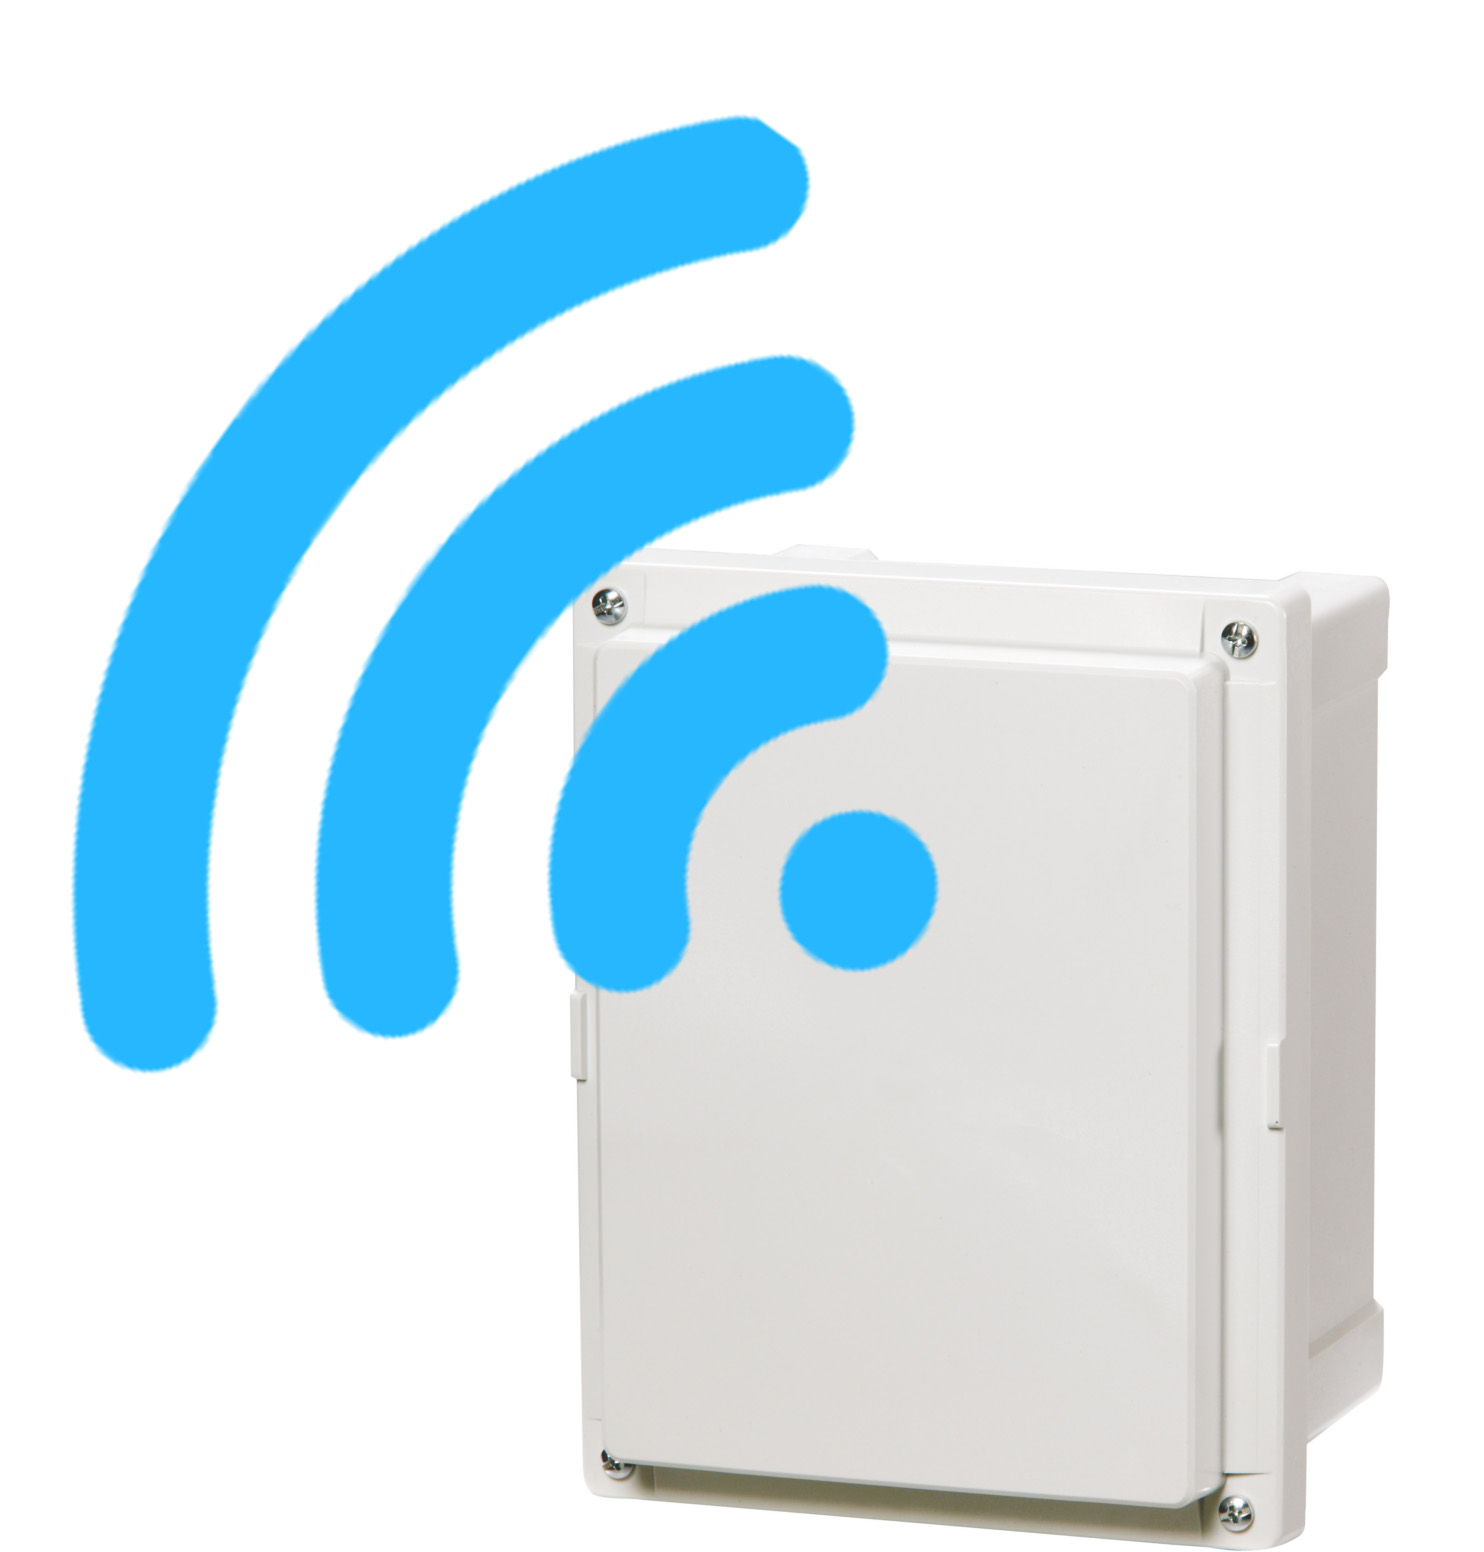 Wifi friendly polycarboante NEMA 4X enclosure